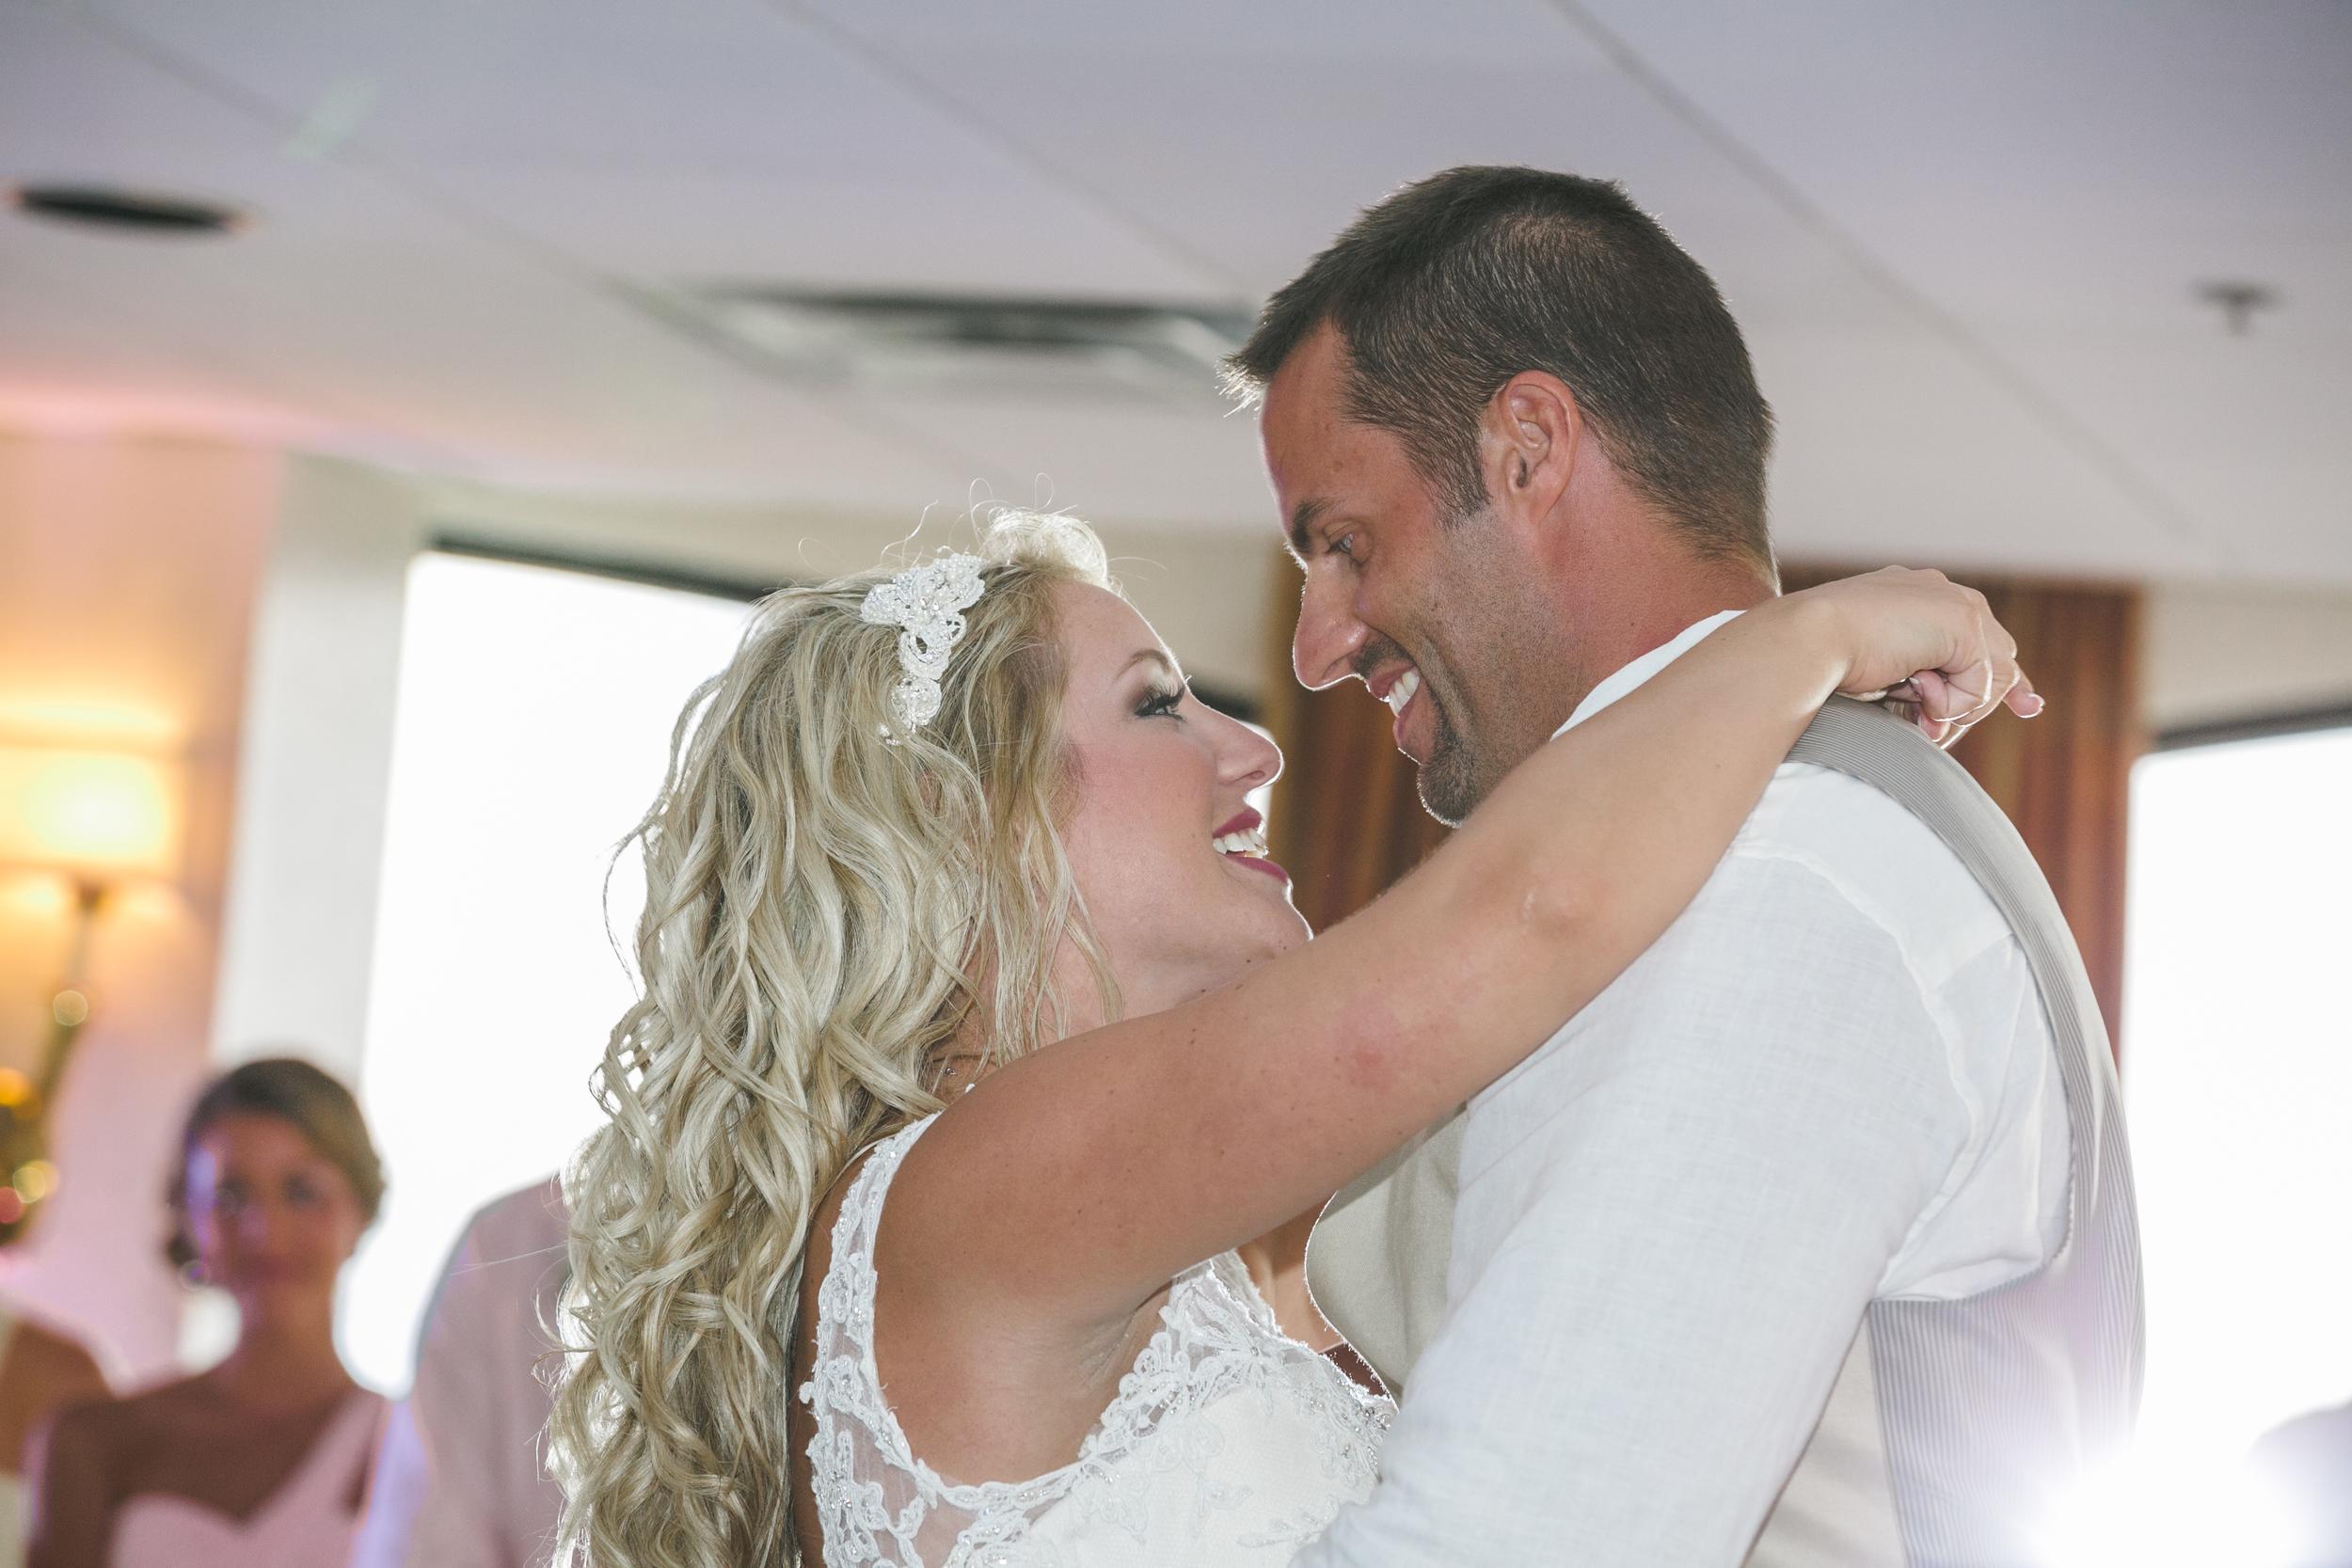 Harris wedding (16 of 72).JPG